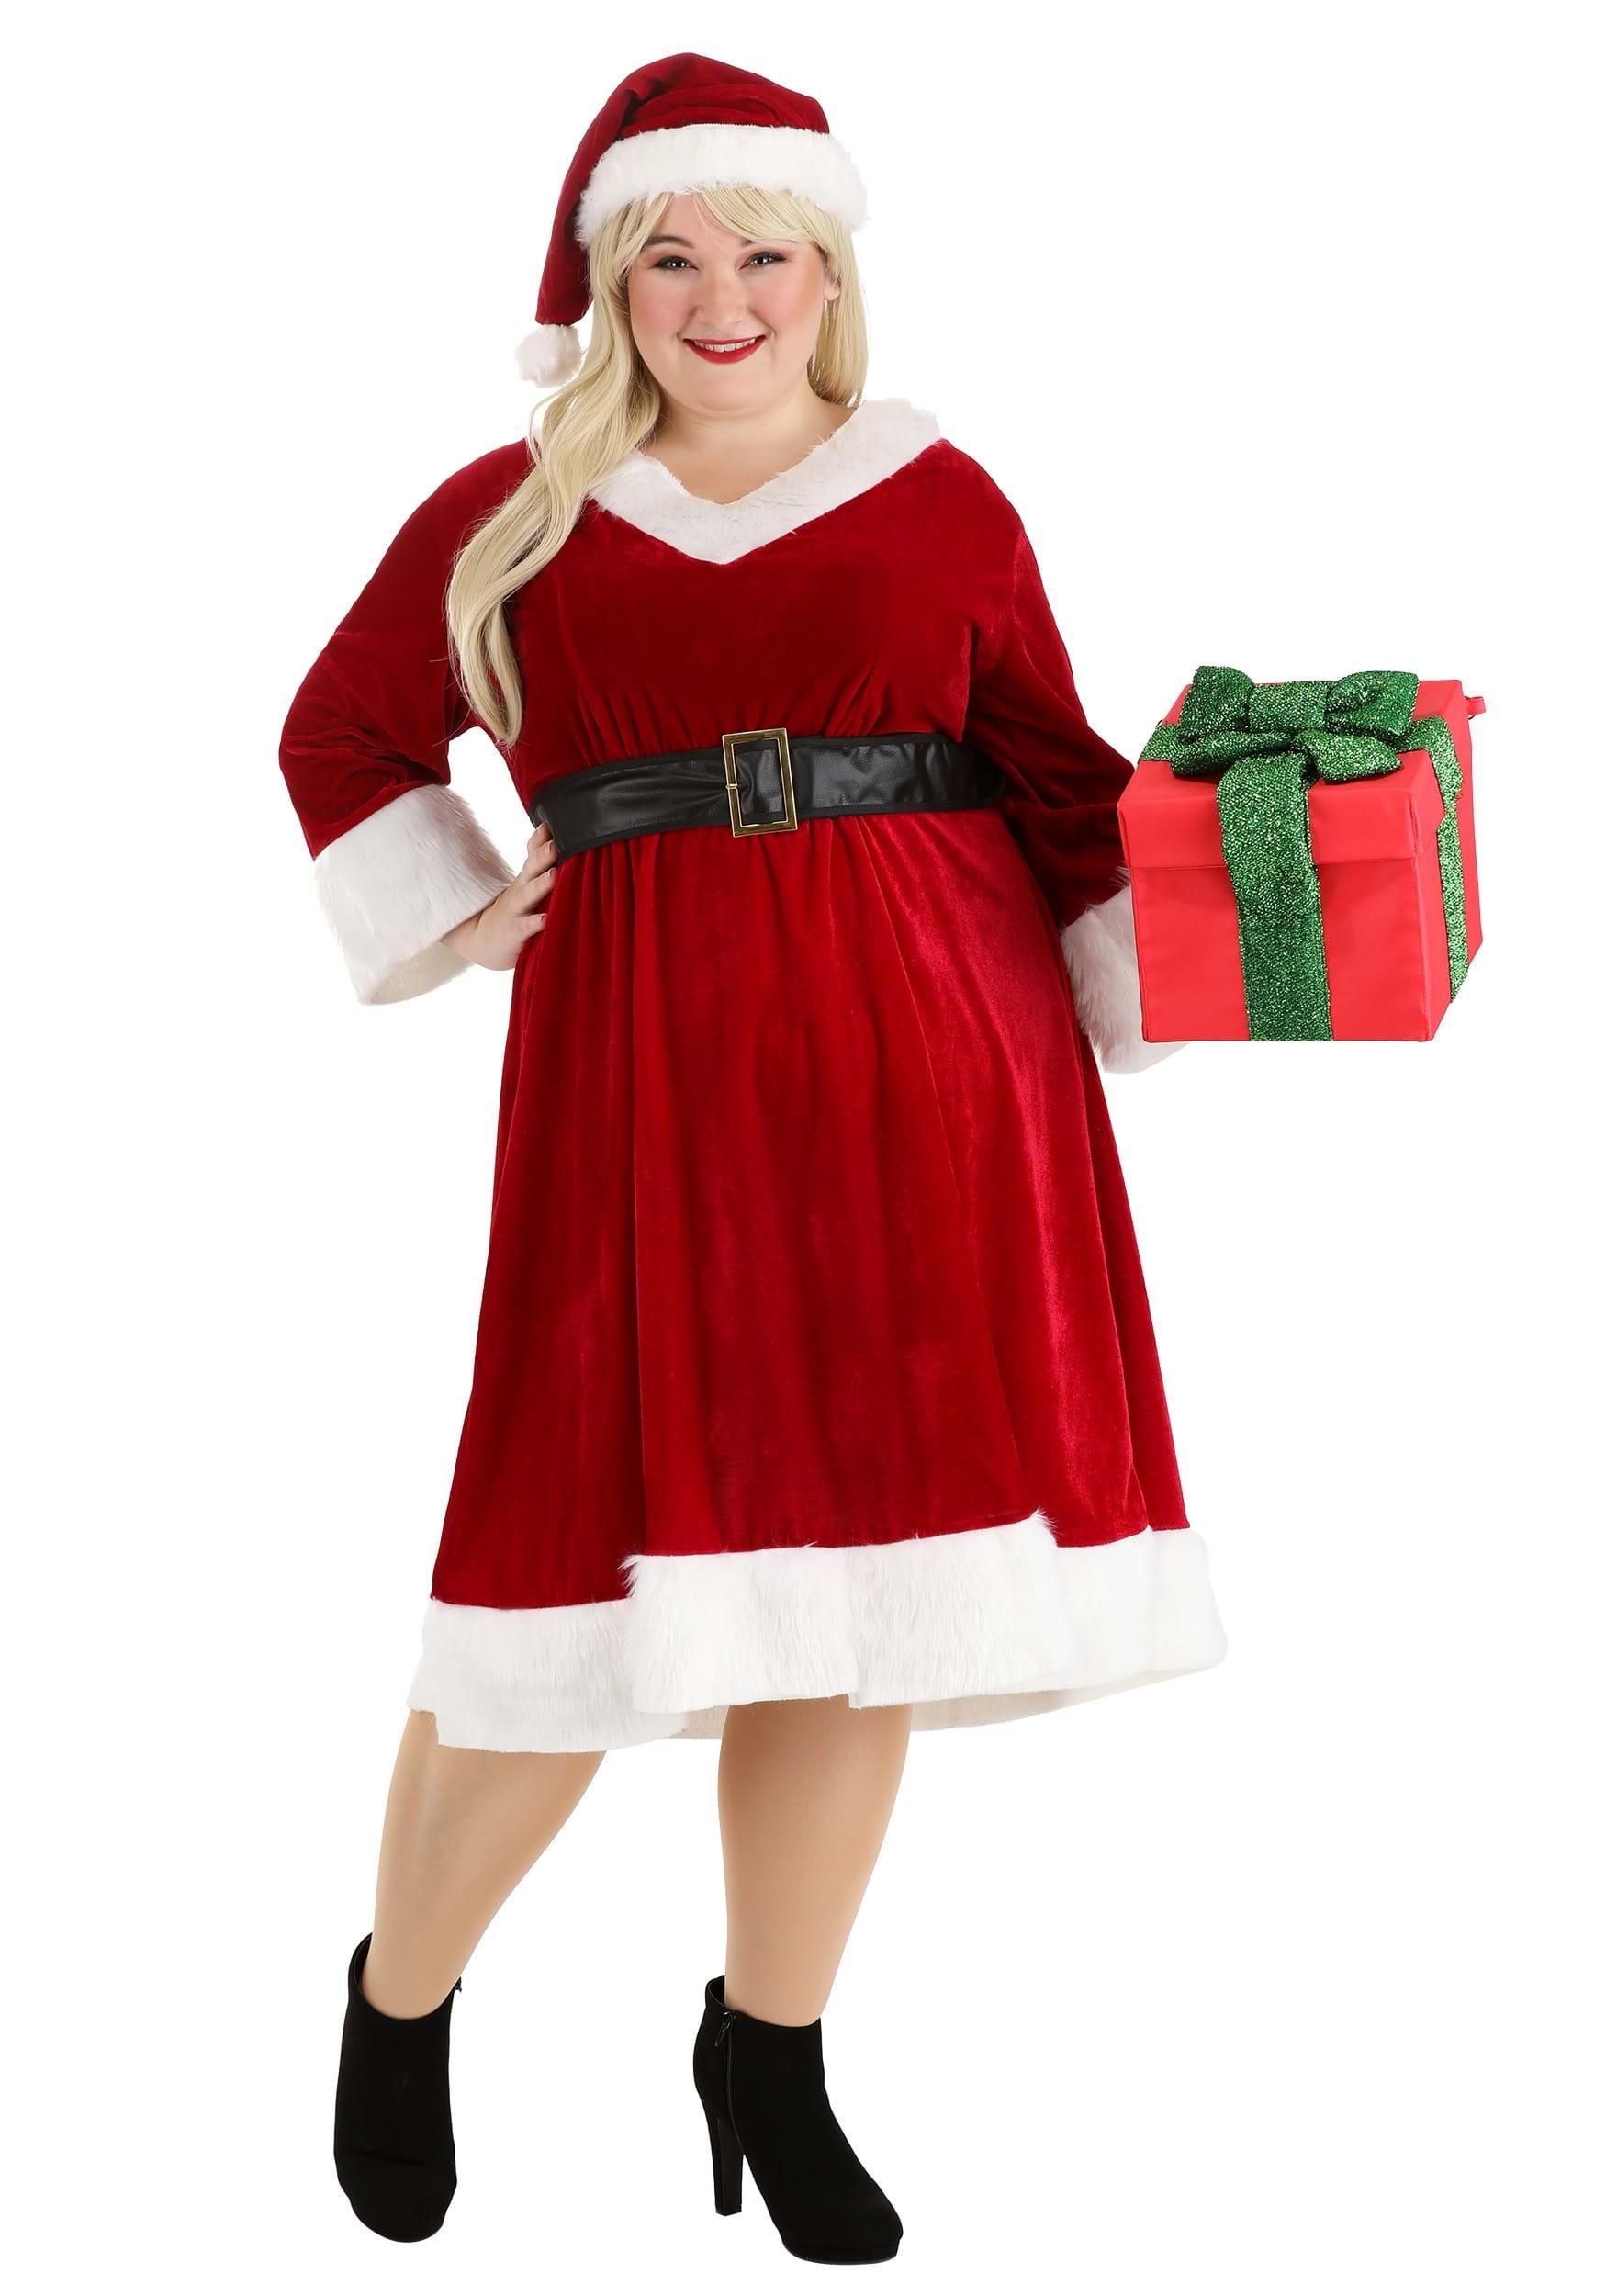 a01043bc9 Santa Claus Costume Uk & Buy Inflatable Santa Claus Costume Fancy ...